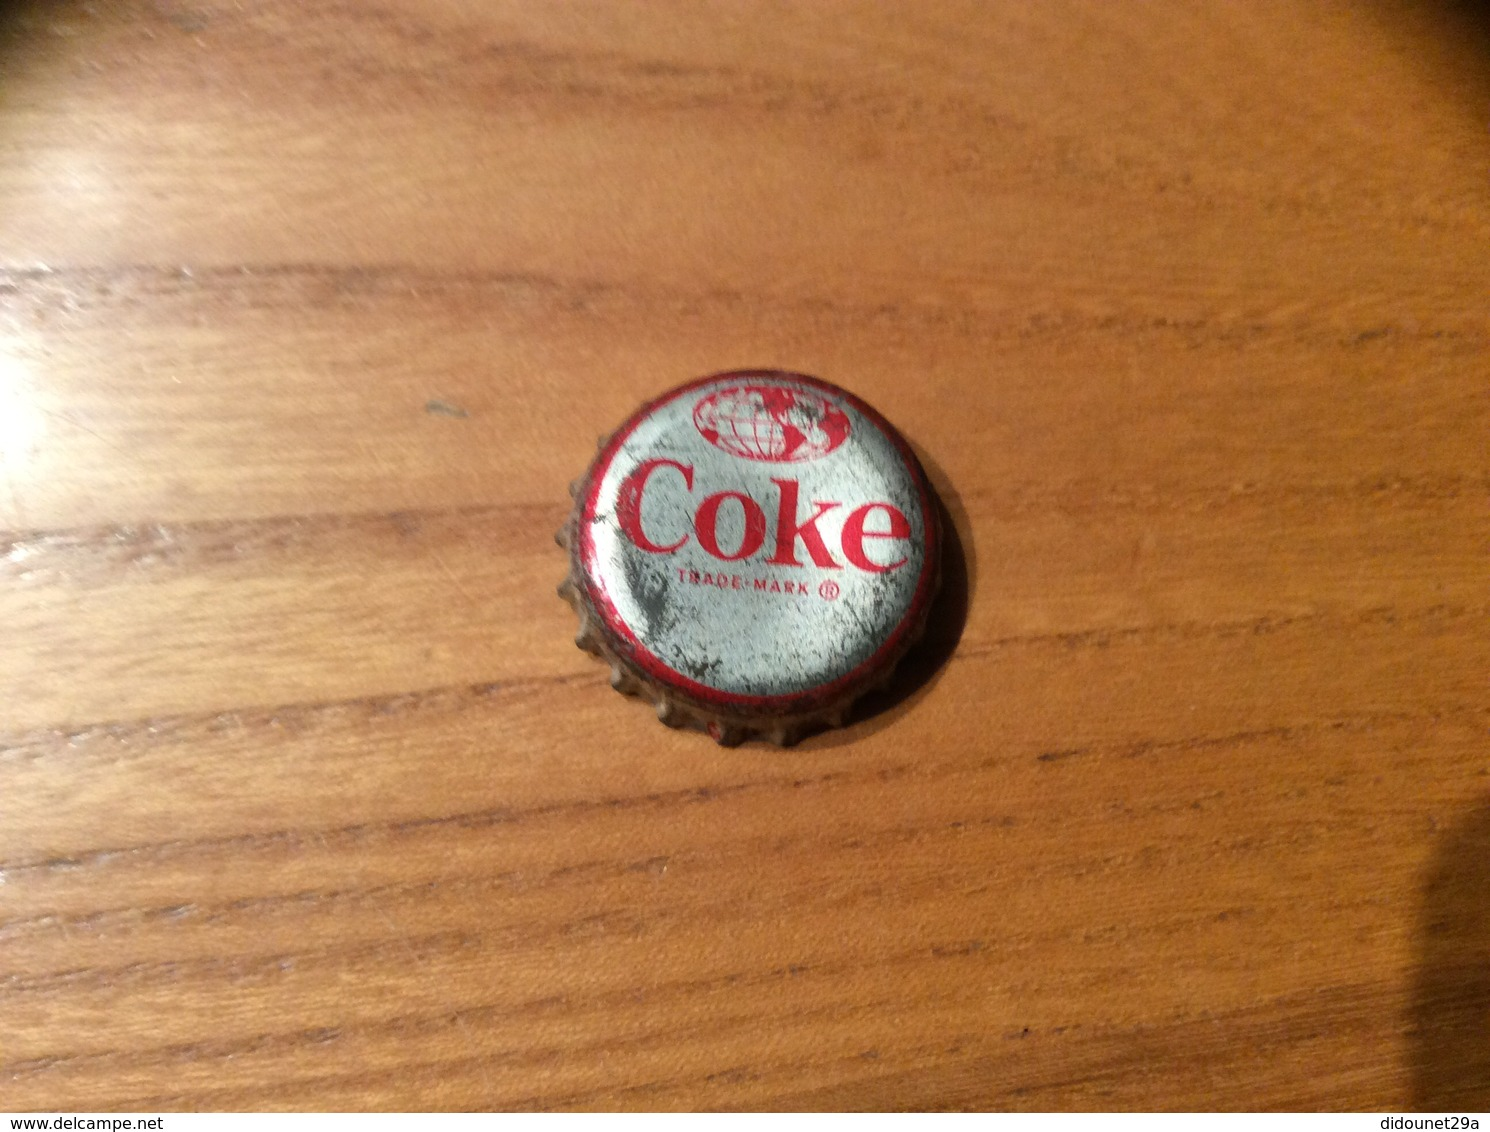 "Ancienne Capsule Soda ""Coke N°29 -EL SALVADOR- CUSCATLAN BRIDGE""Etats-Unis (USA) Coca-Cola, Série Pays (Liège Enlevé) - Soda"